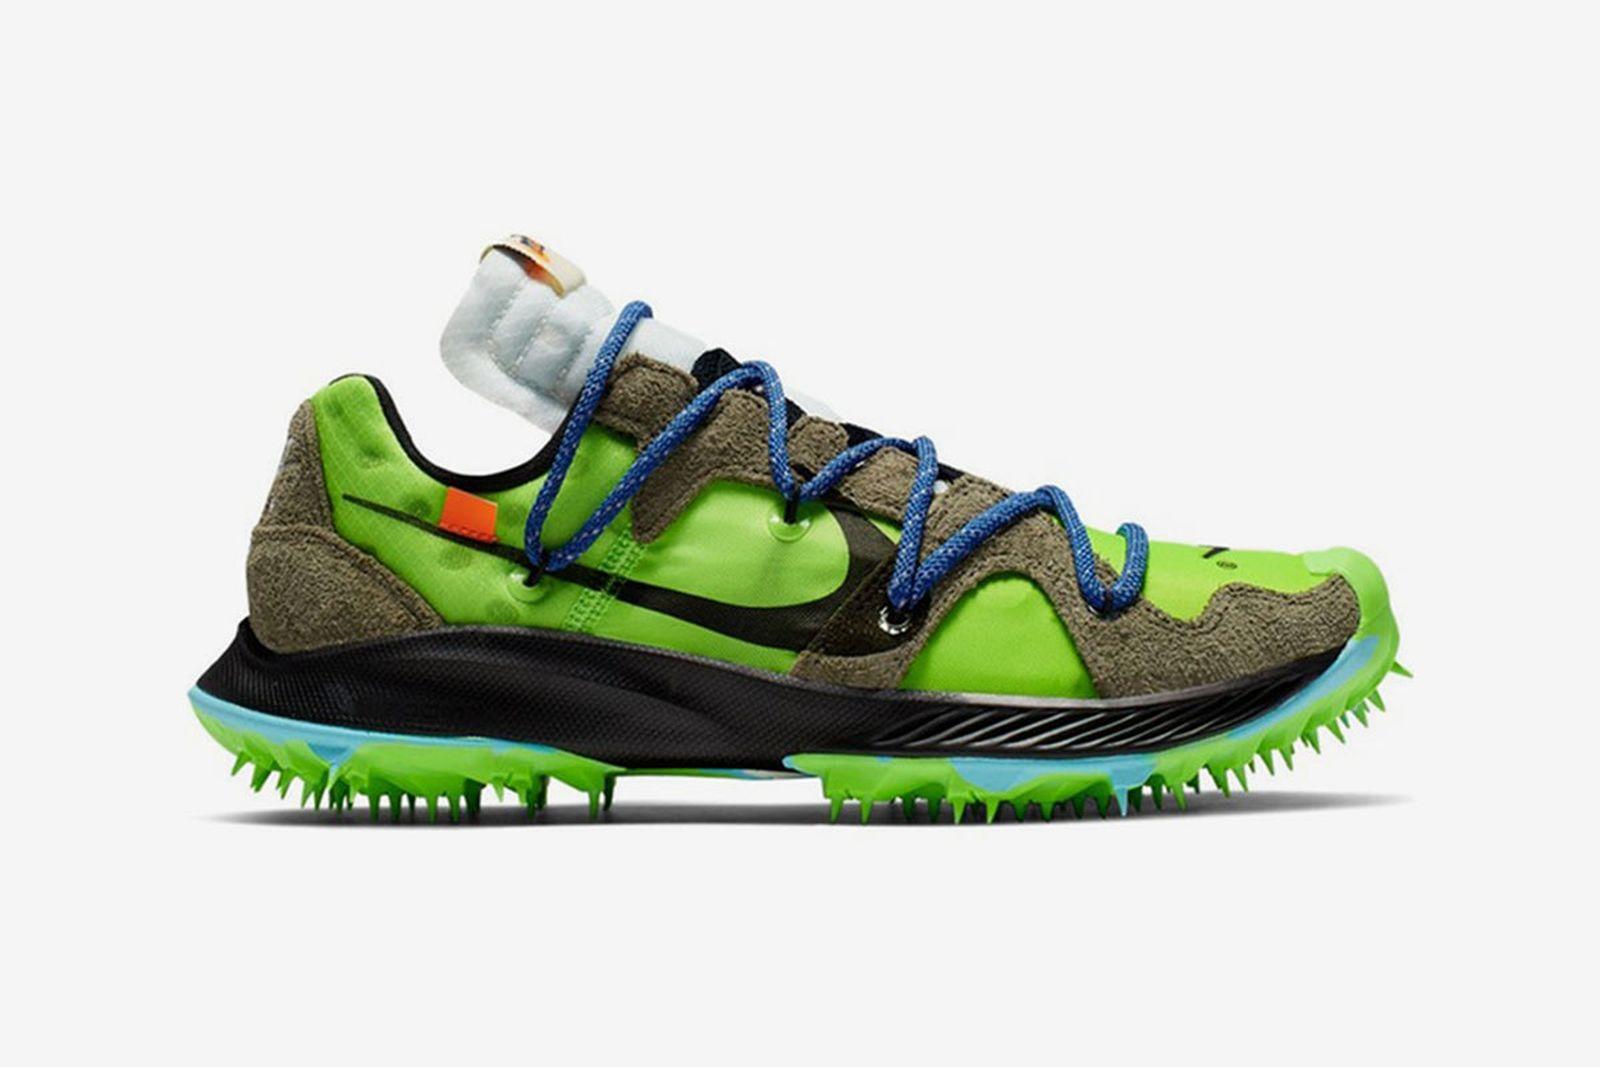 Nike Zoom Terra Kiger 5 01 StockX nike x off-white virgil abloh